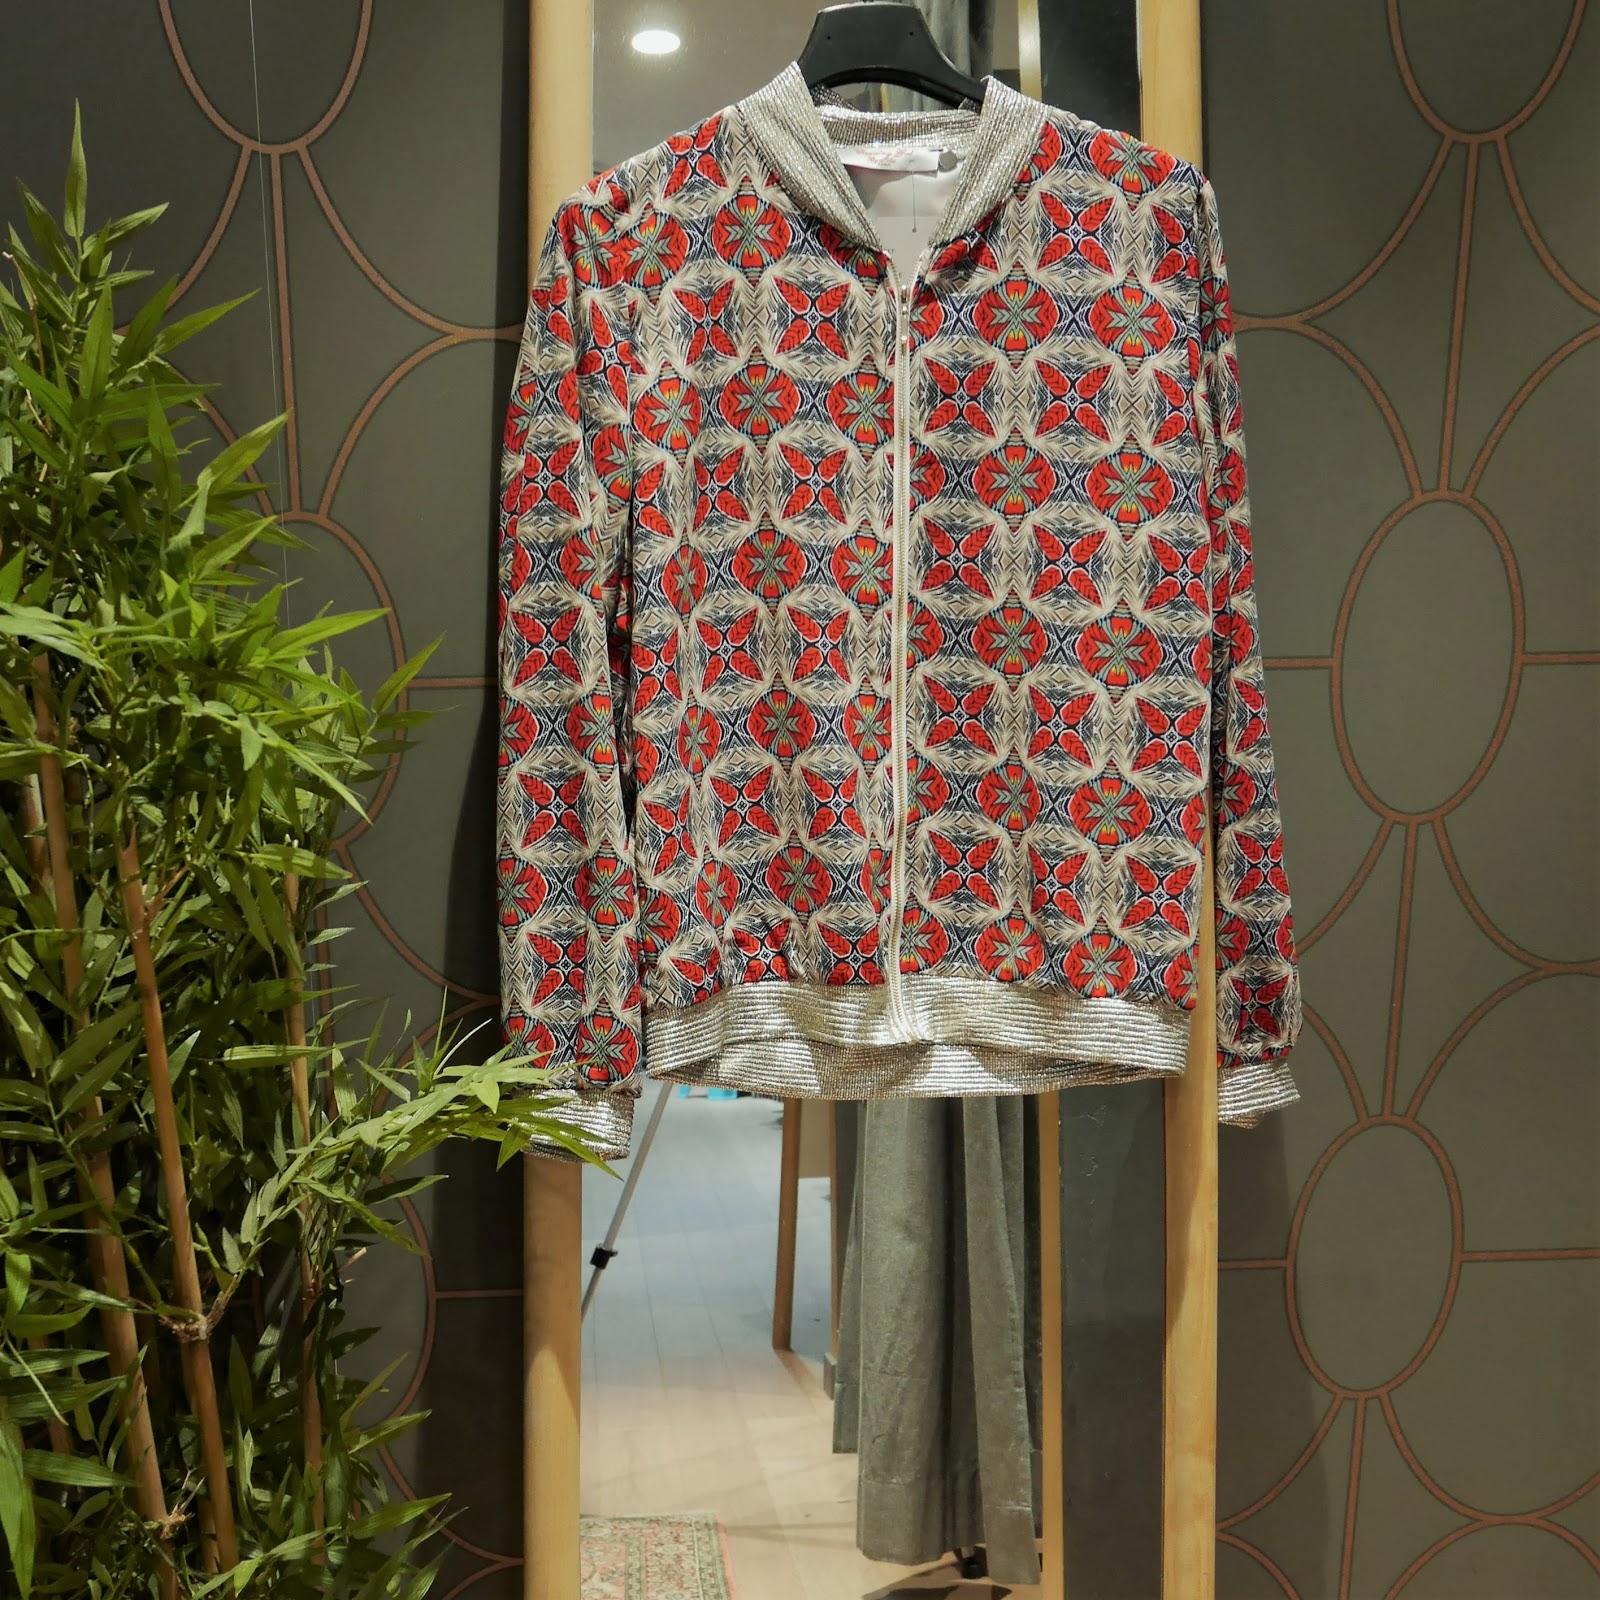 twinz-boutique-pret-a-porter-antony-veste-pull-danslaruedacote.fr